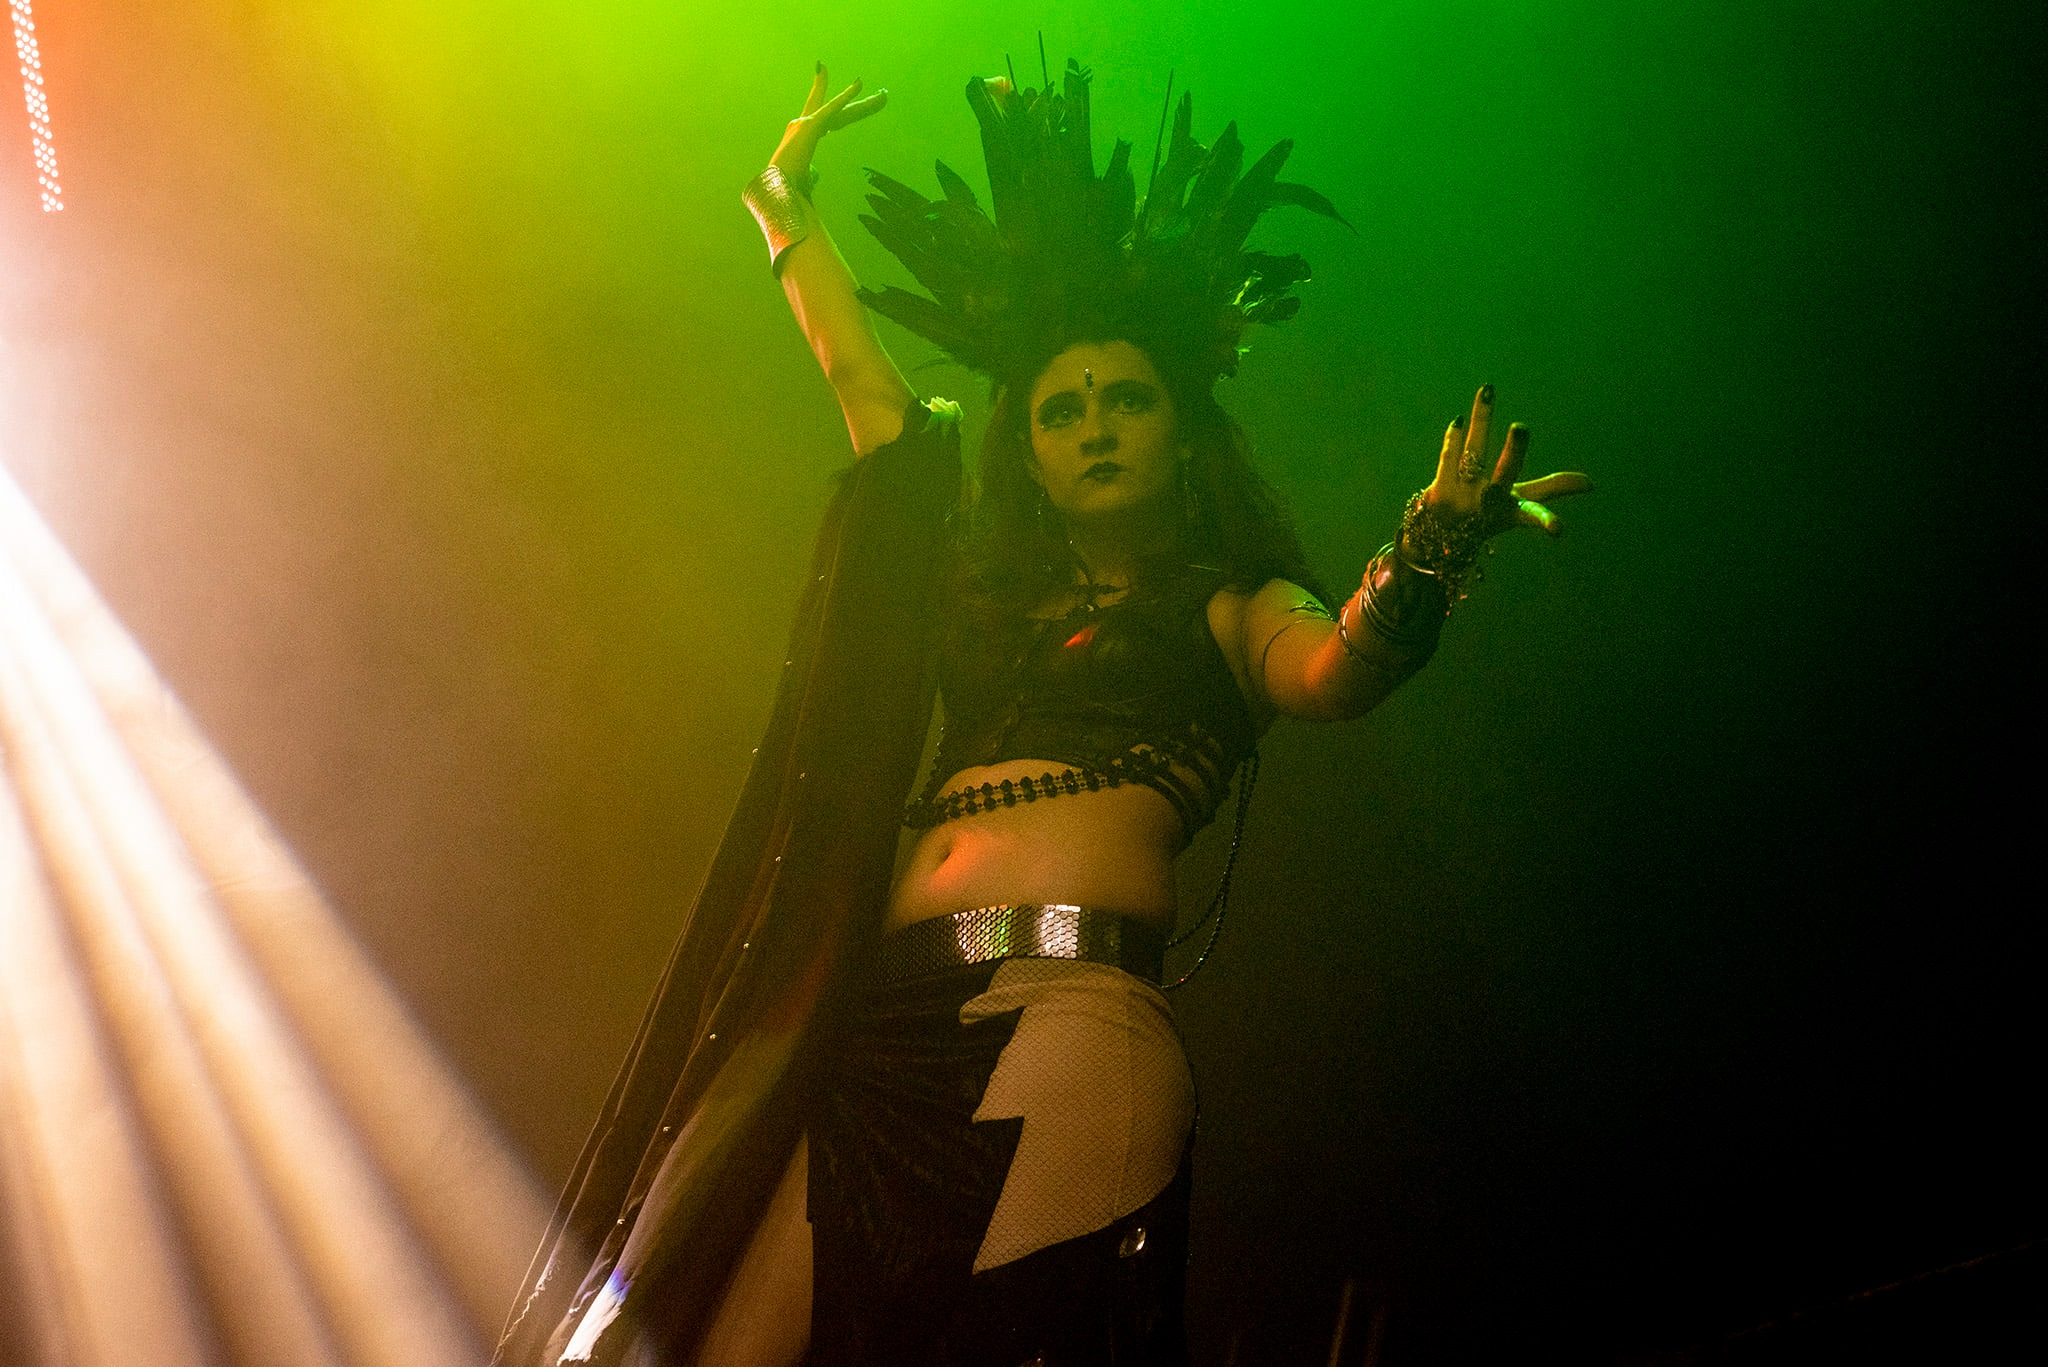 goth-rock-metal_hastanciskola.jpg